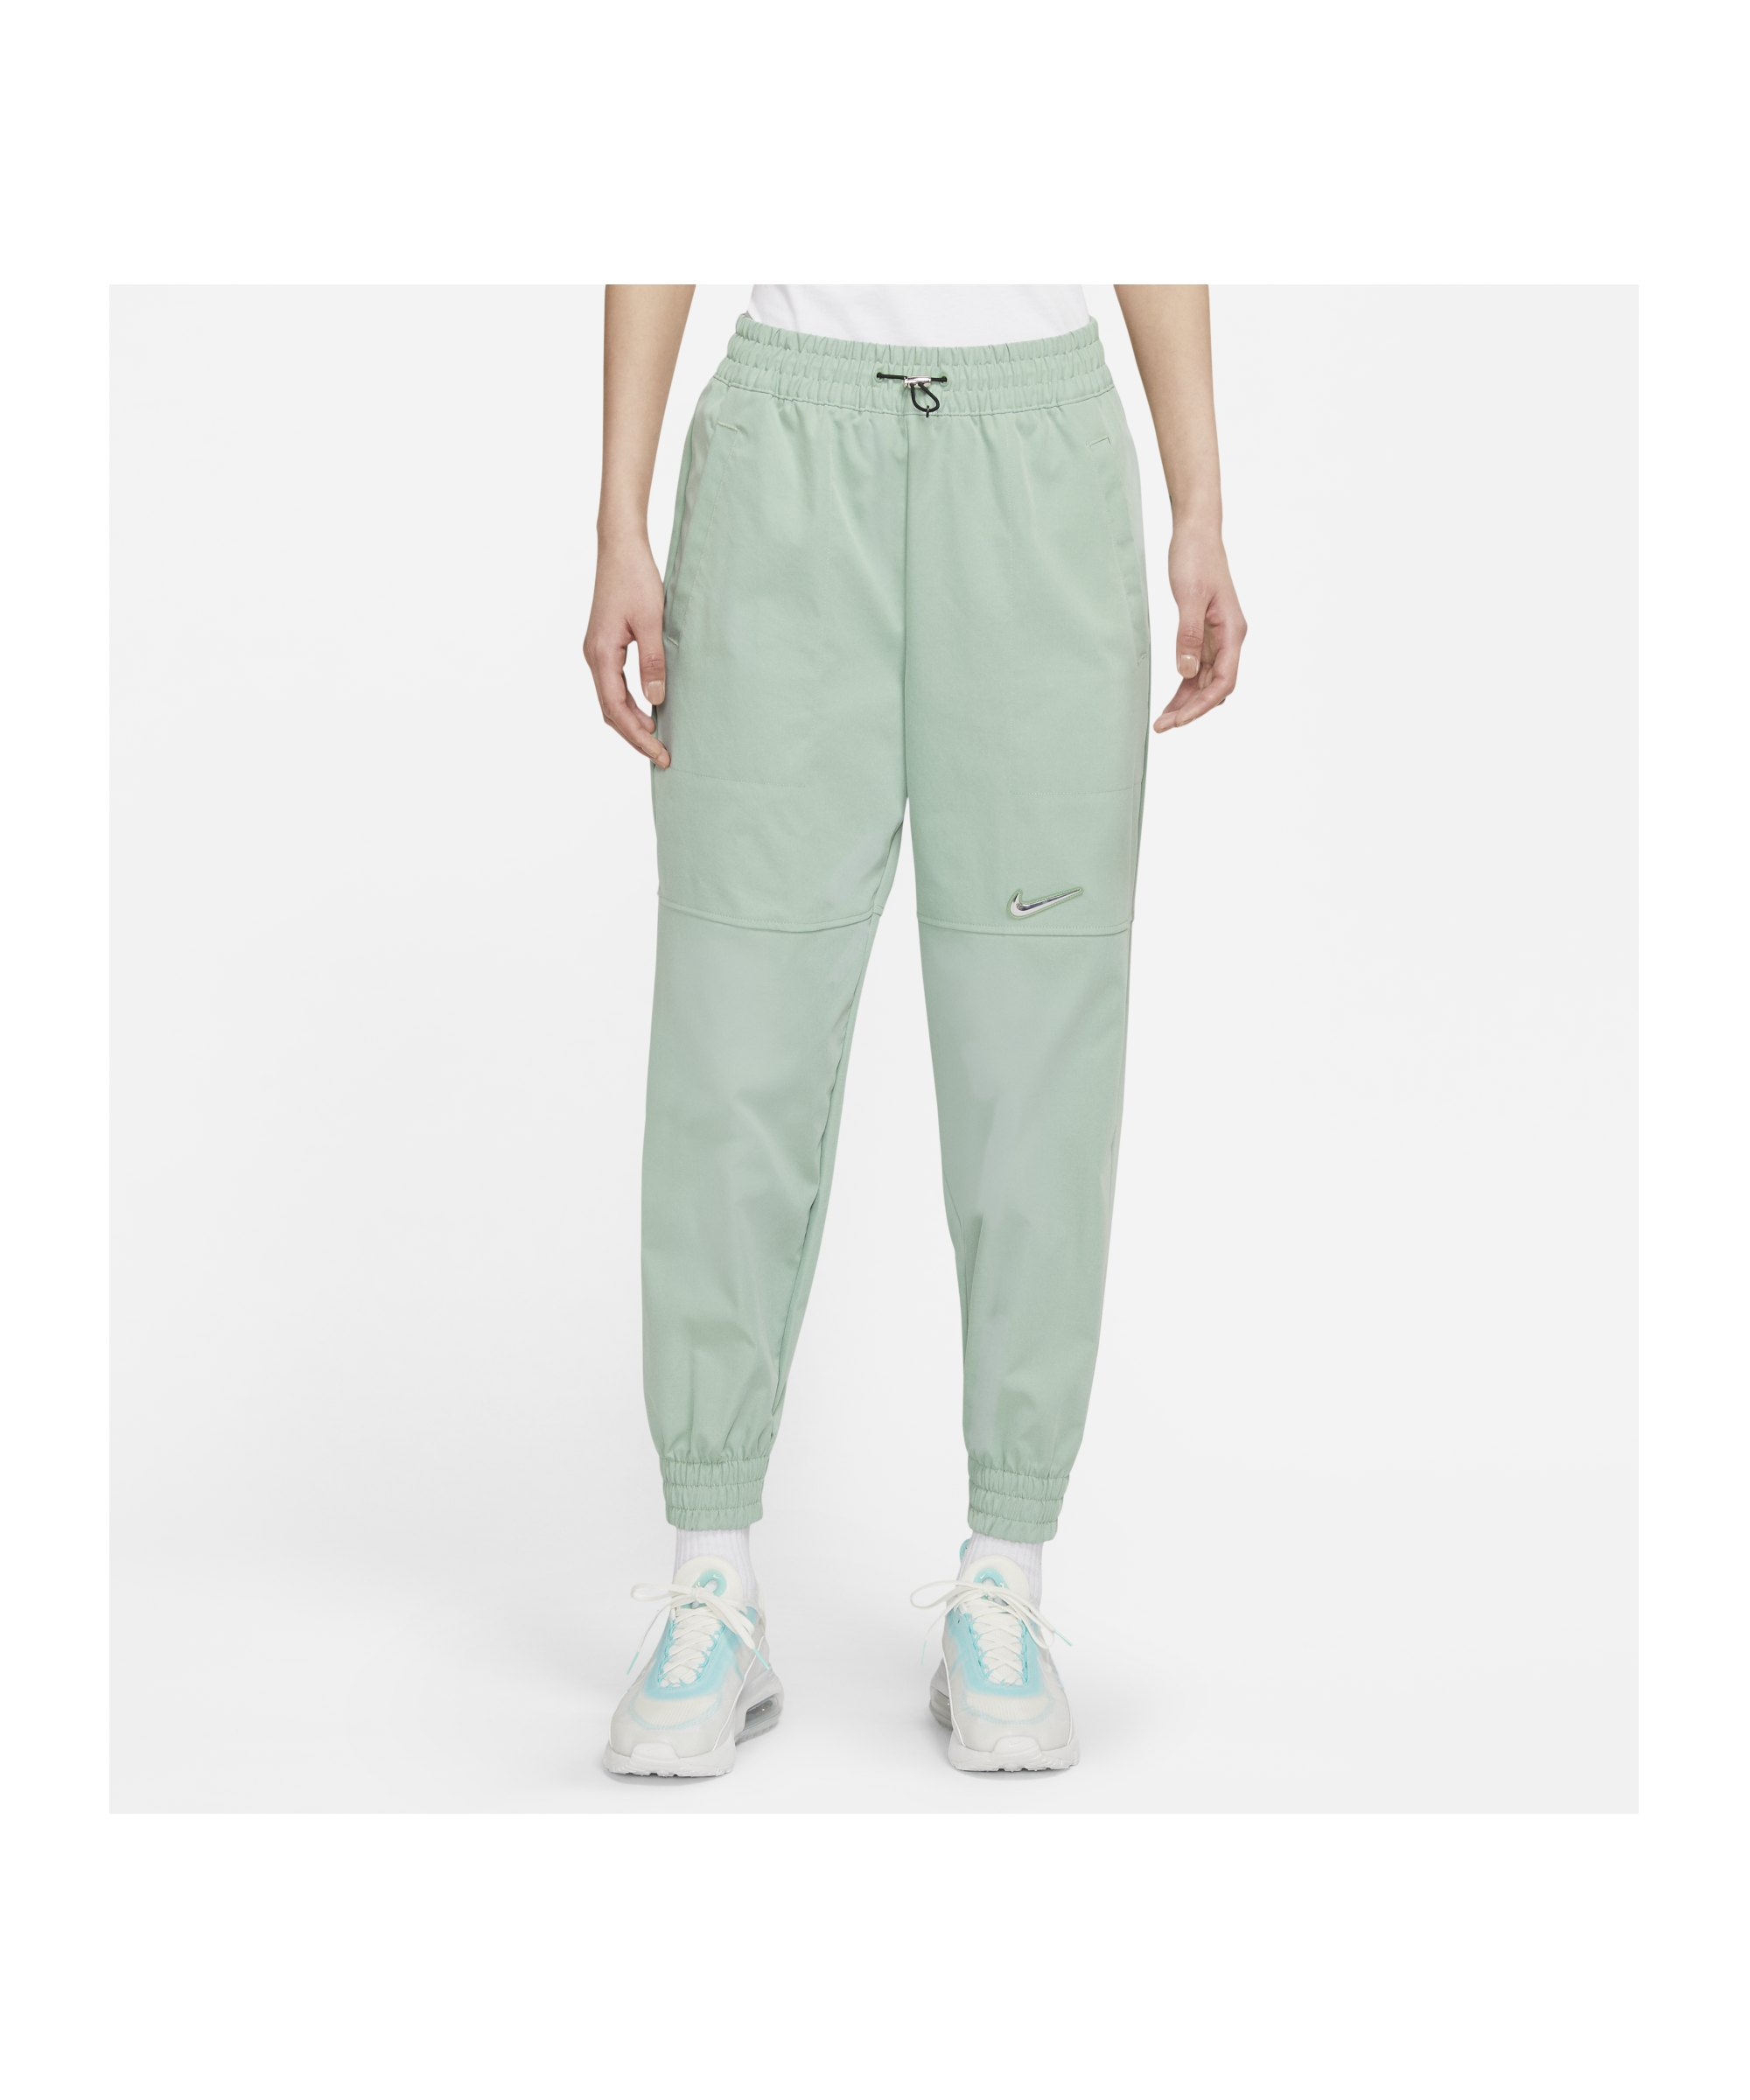 Nike Swoosh Woven Jogginghose Damen Grün F006 - grau